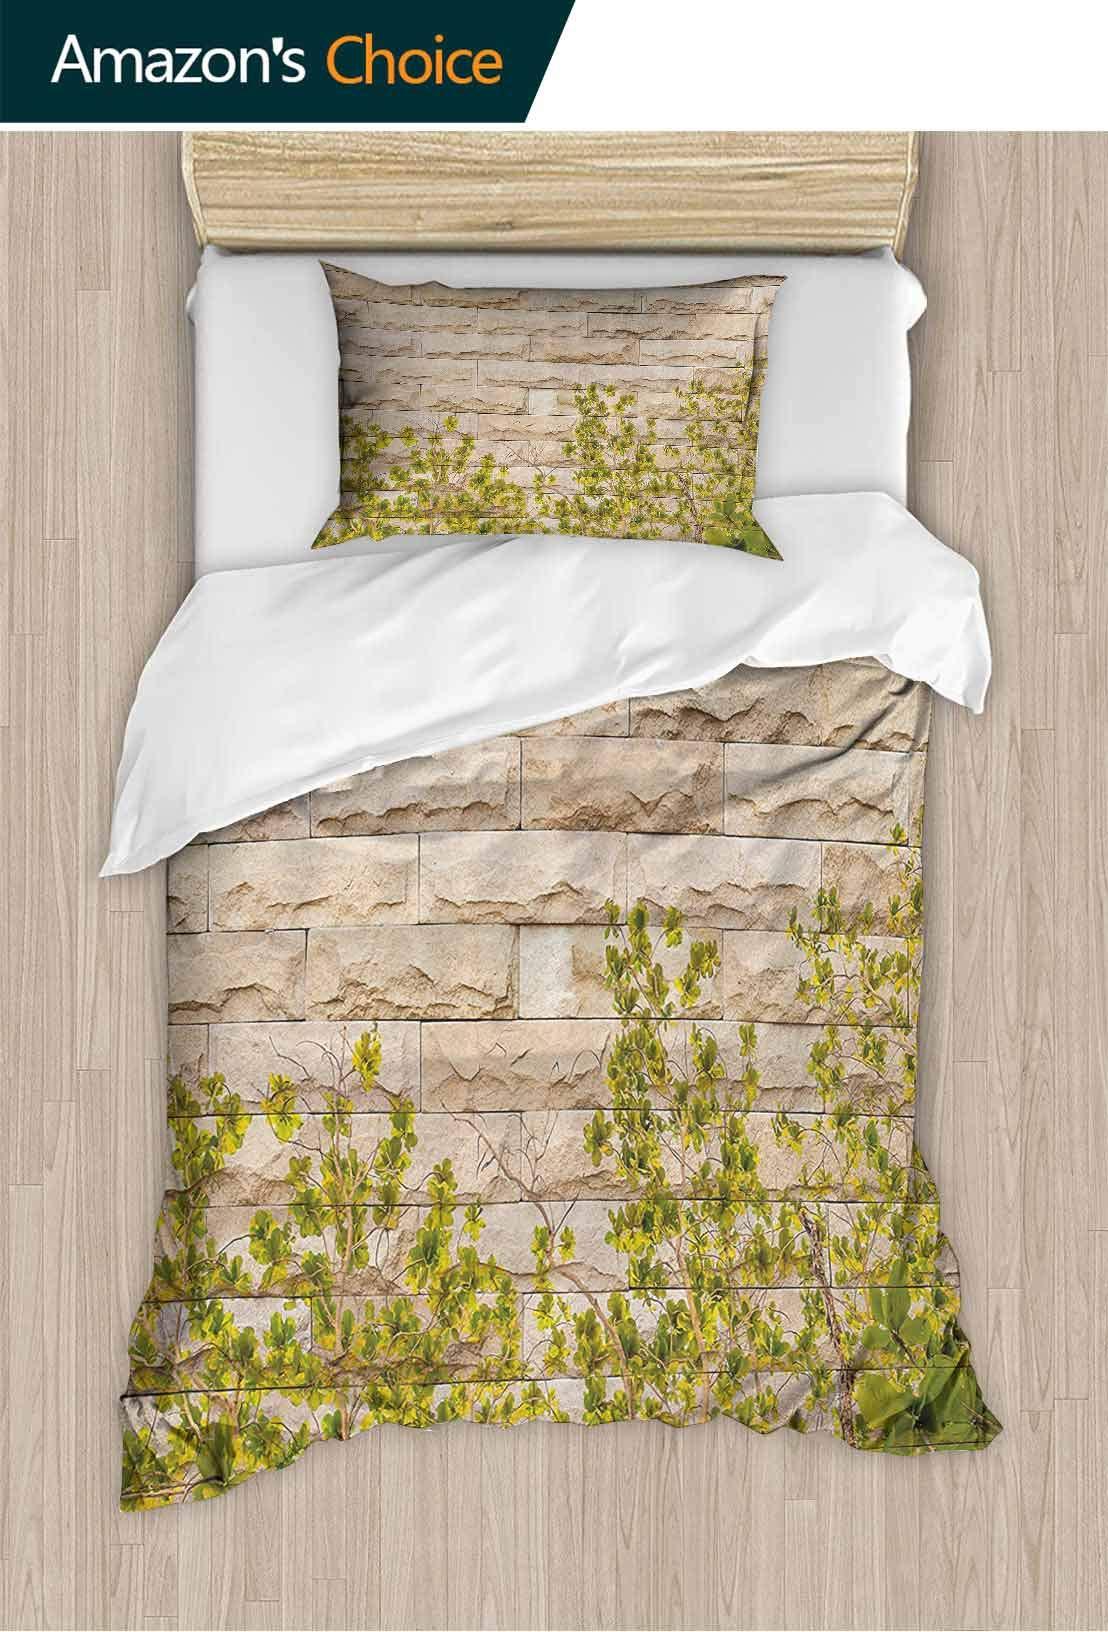 PRUNUSHOME Bed Sheet Set Super Soft Polyester Ground Creepy Climbing Wood Ivy Plant Leaf Brick Wall Nature Invasi Wrinkle Resistance Full